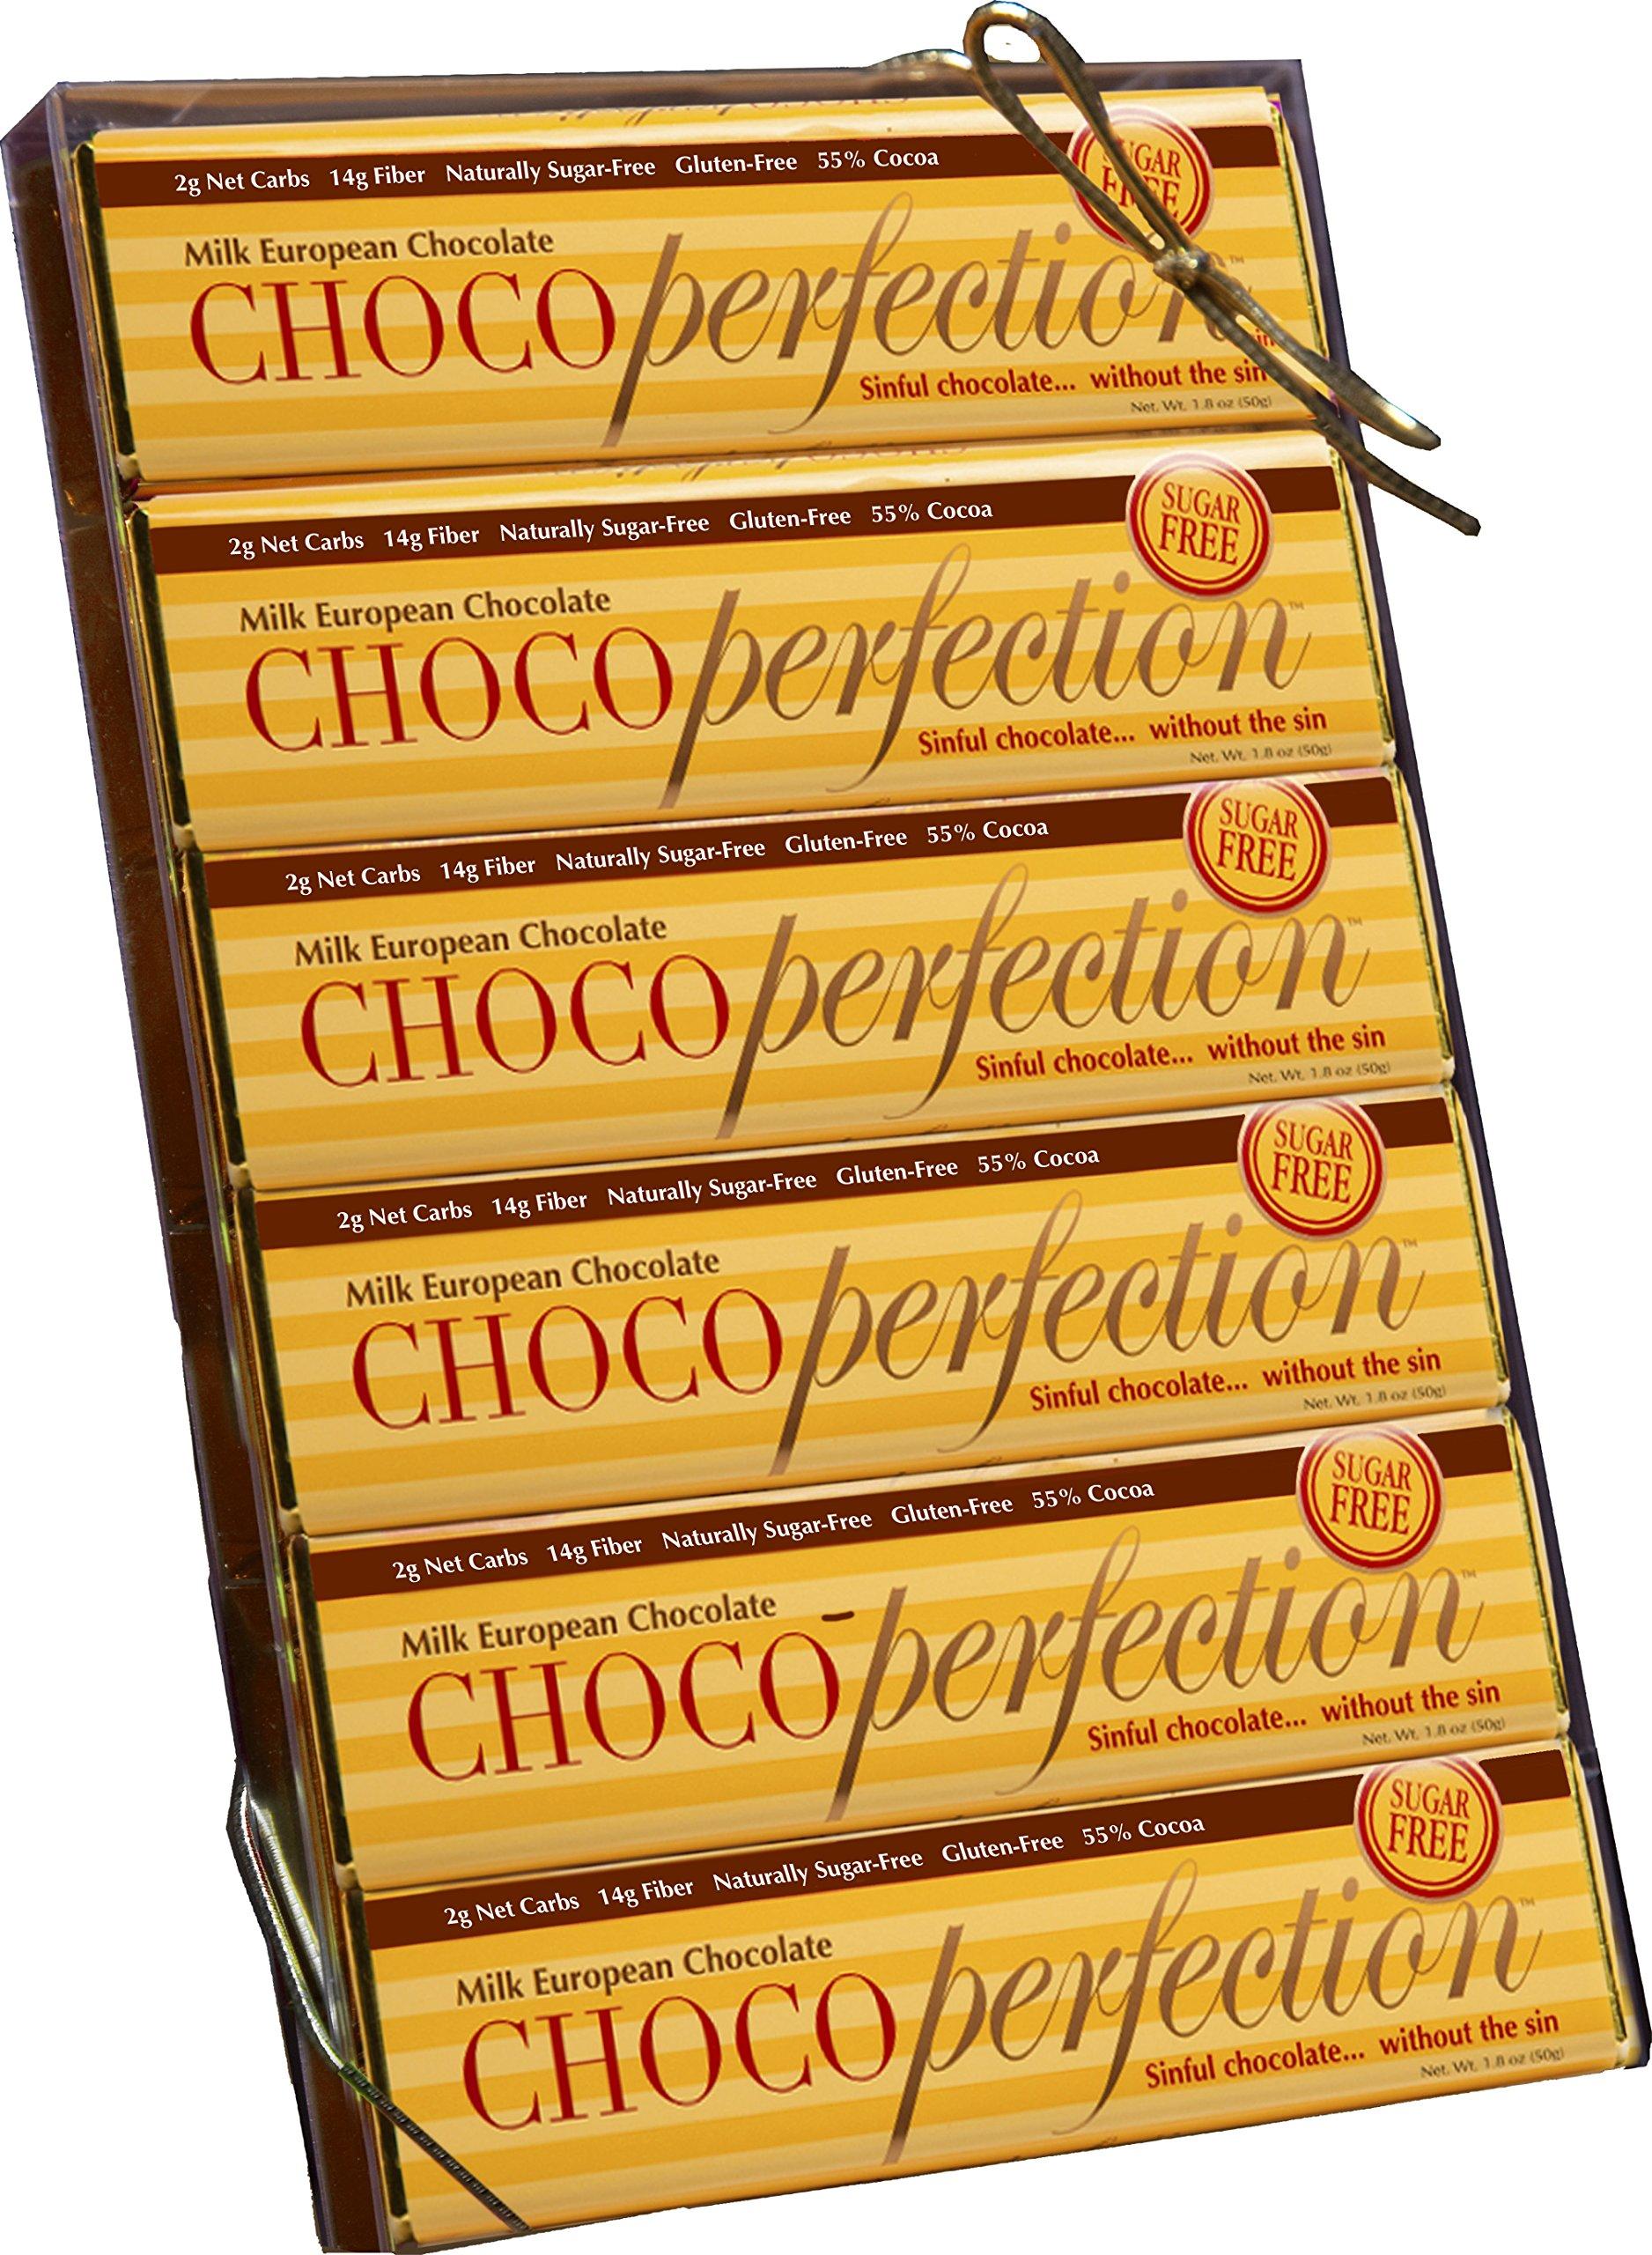 ChocoPerfection 1.8 oz. Sugar Free Milk Chocolate Bars - No Maltitol - Box of 12 Bars